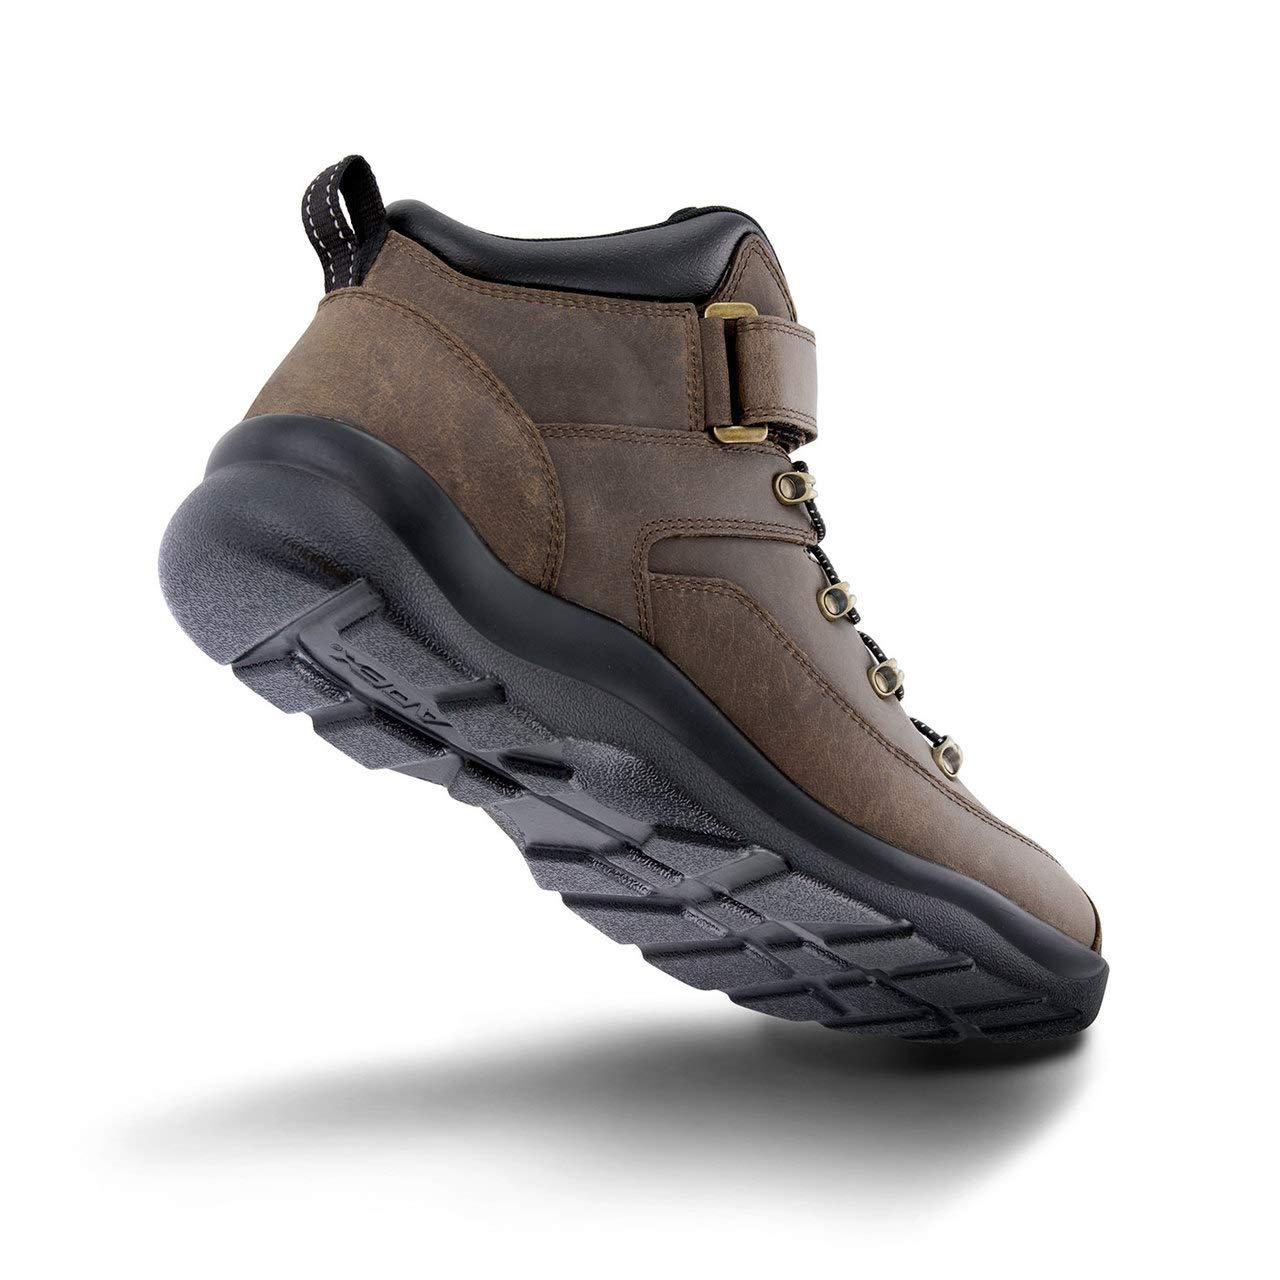 Apex Mens Ariya Hiking Boot